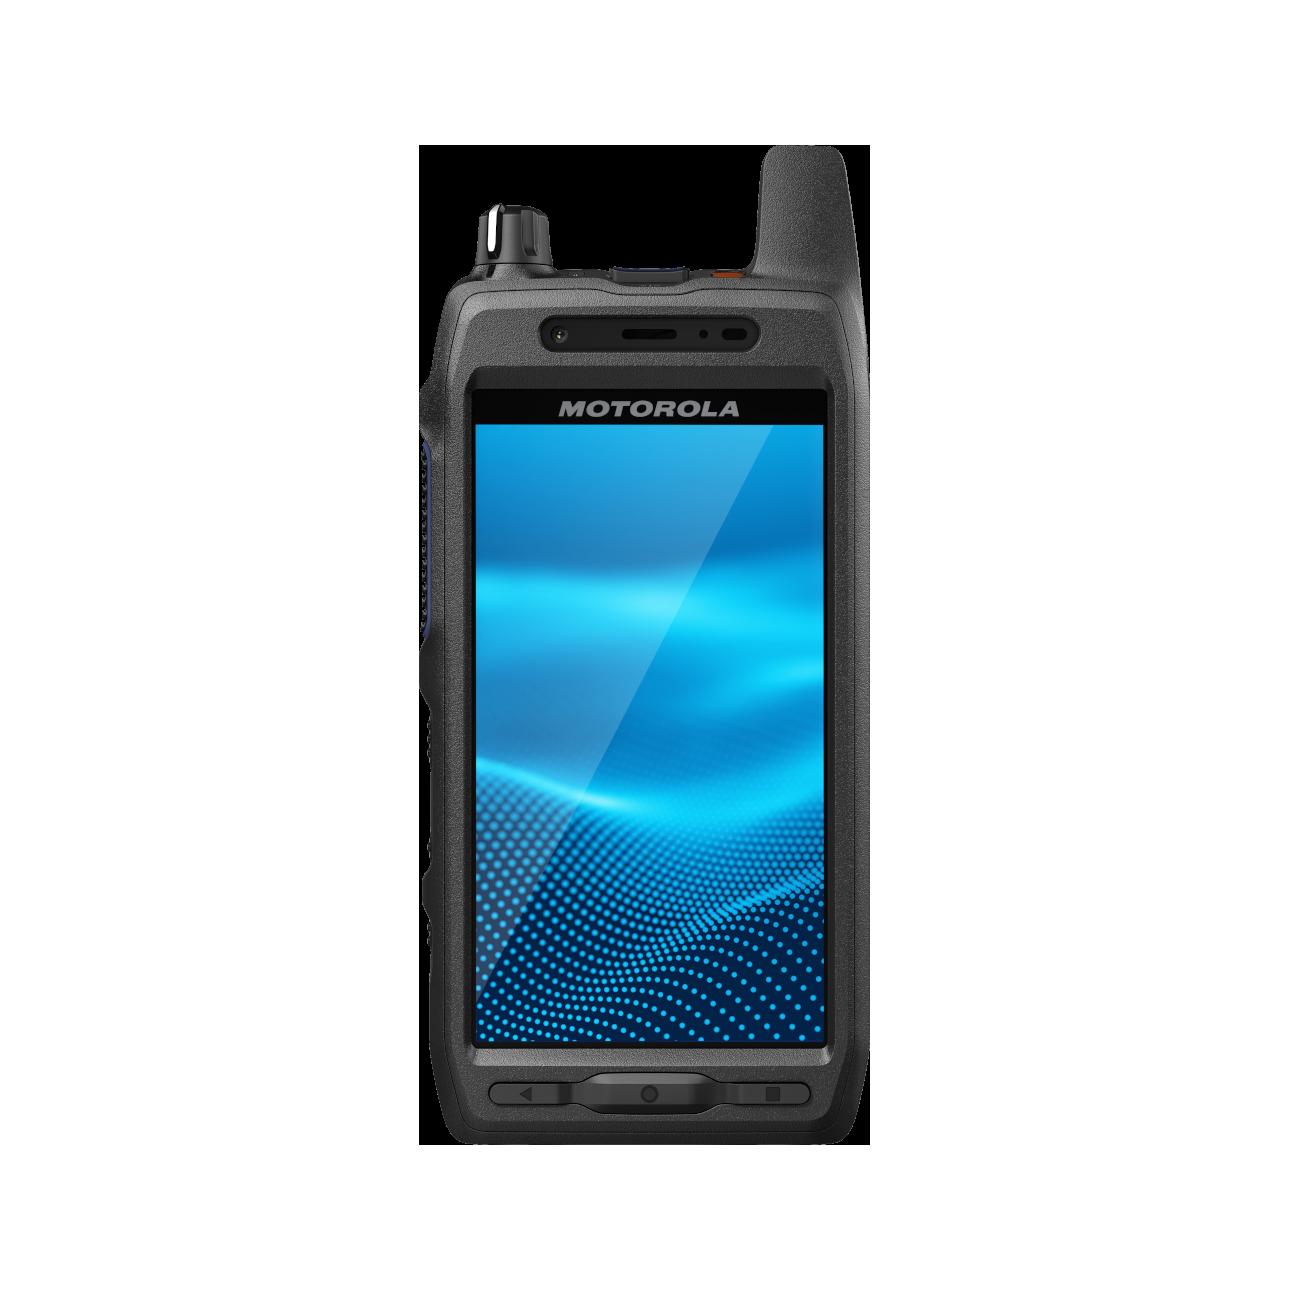 EVOLVE LTE Handheld